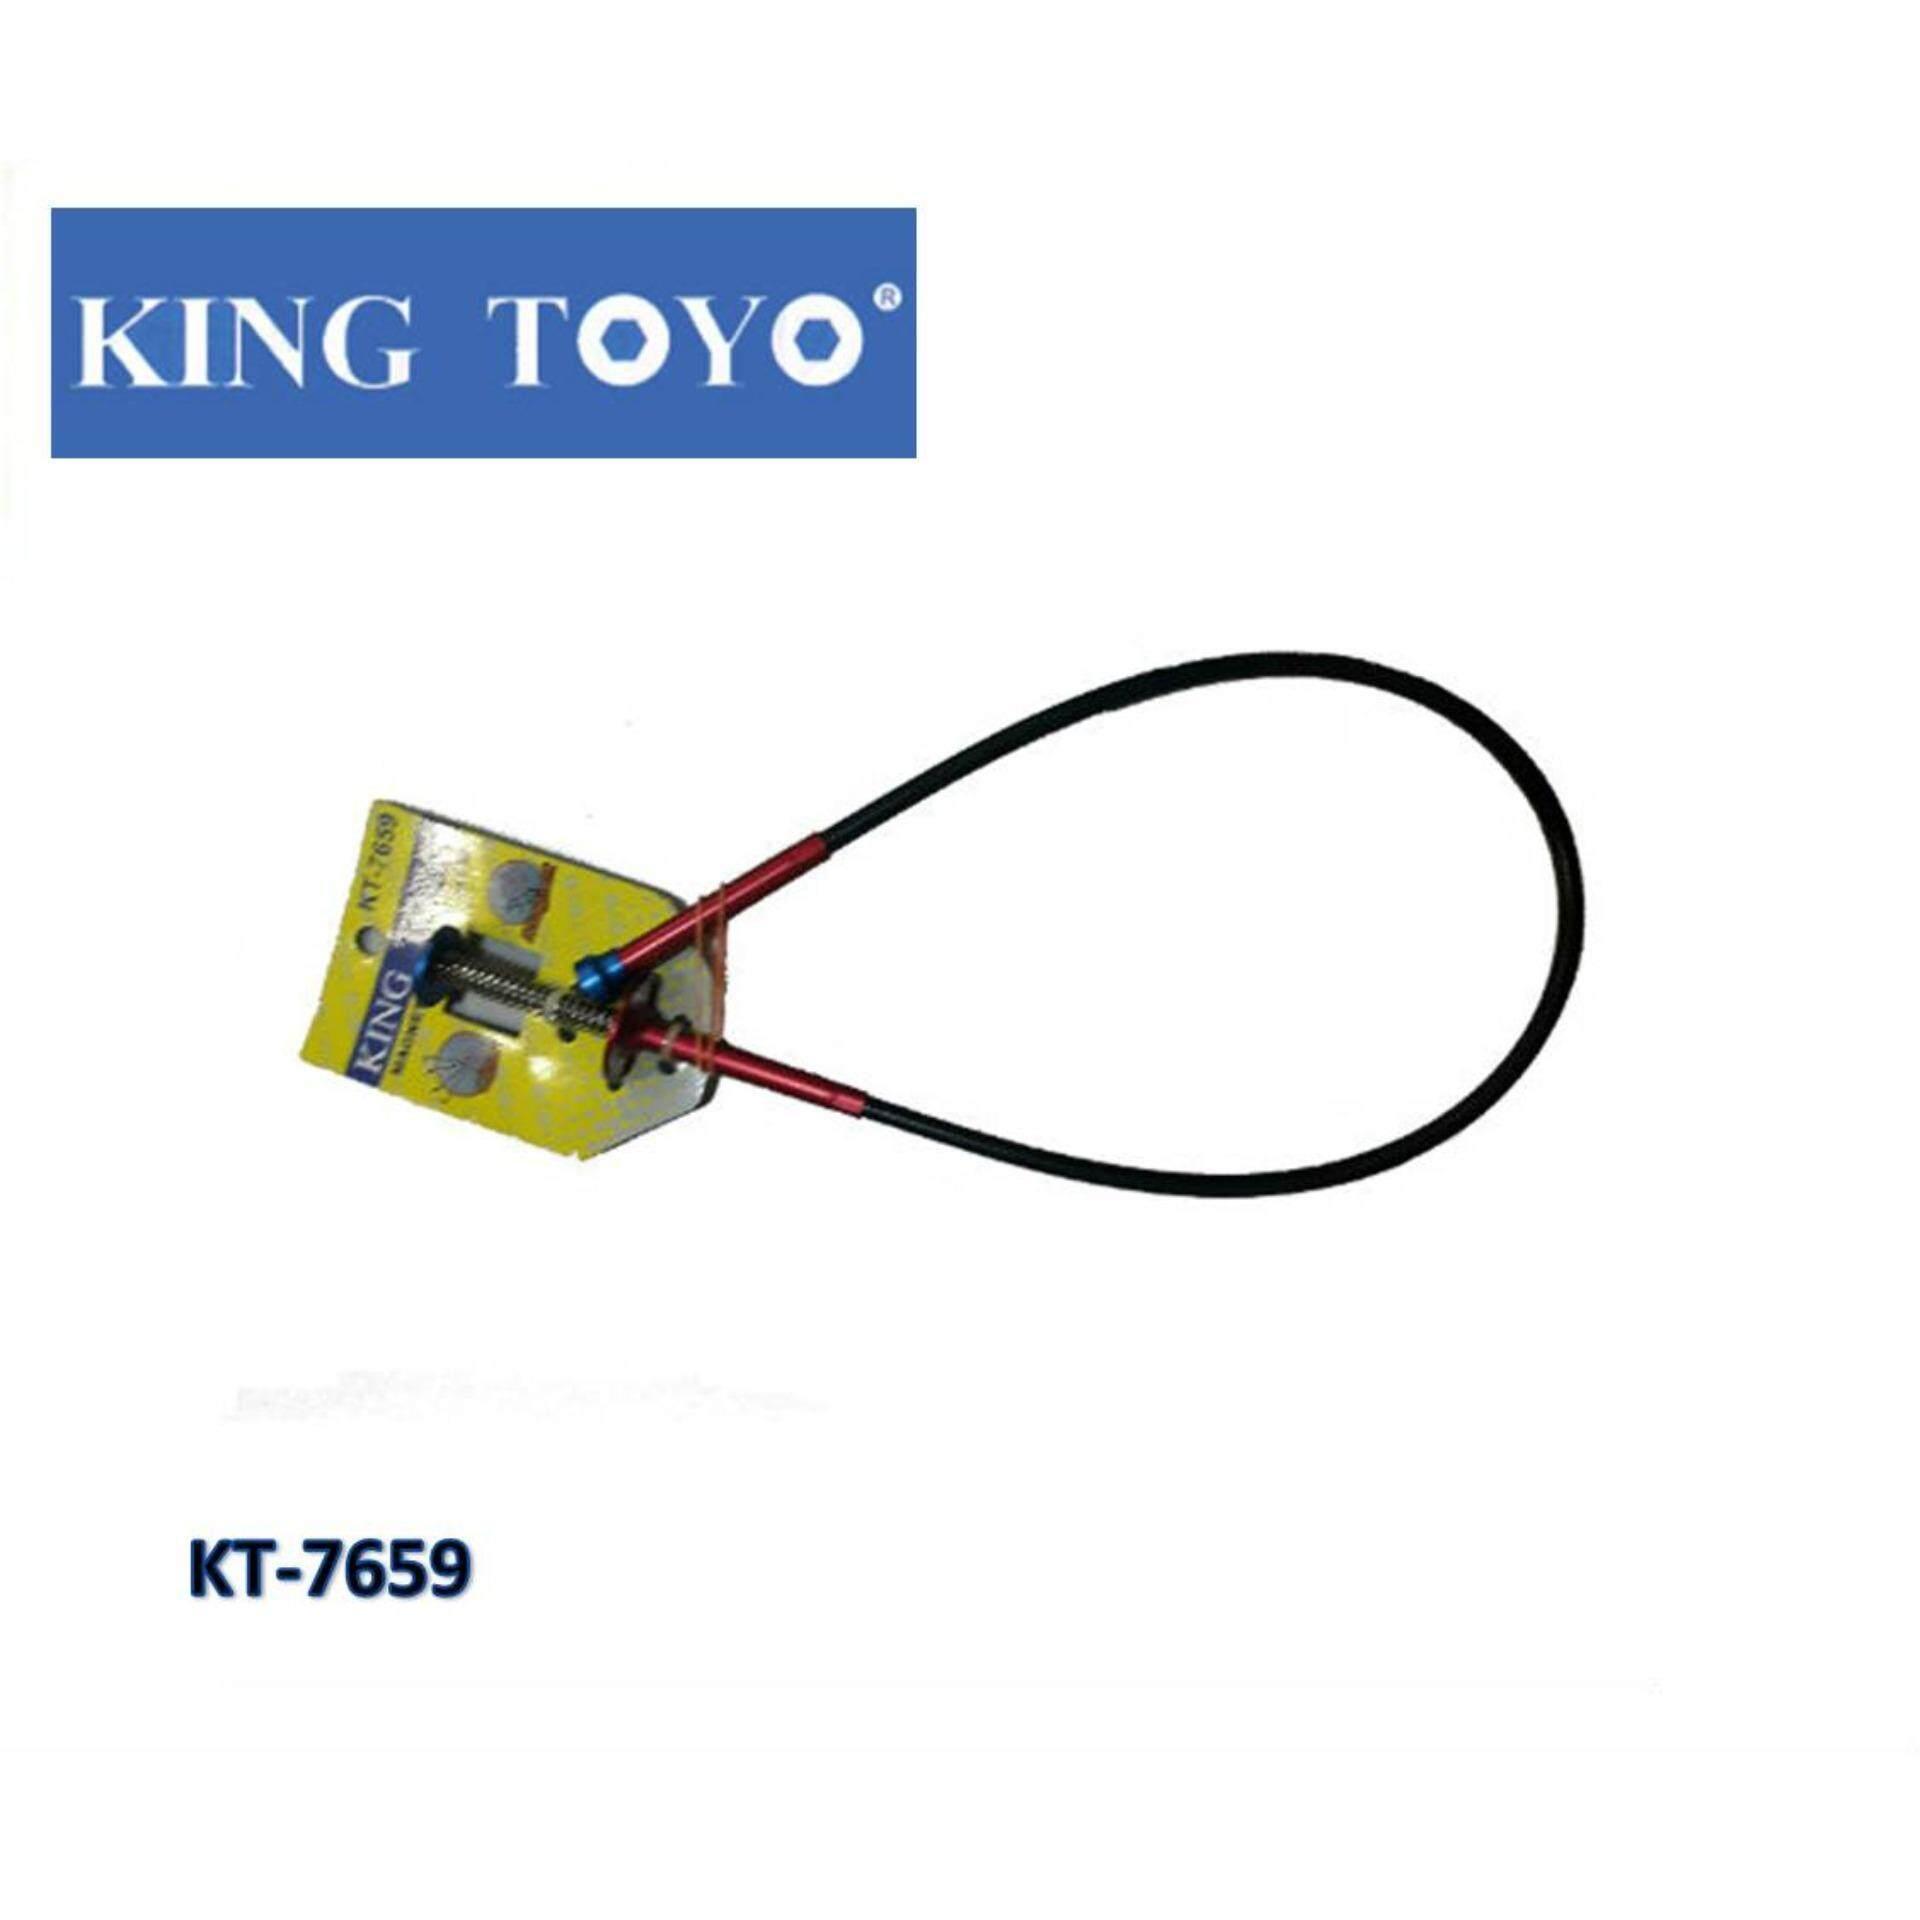 King Toyo KT-7659 Flexible Magnetic Bar